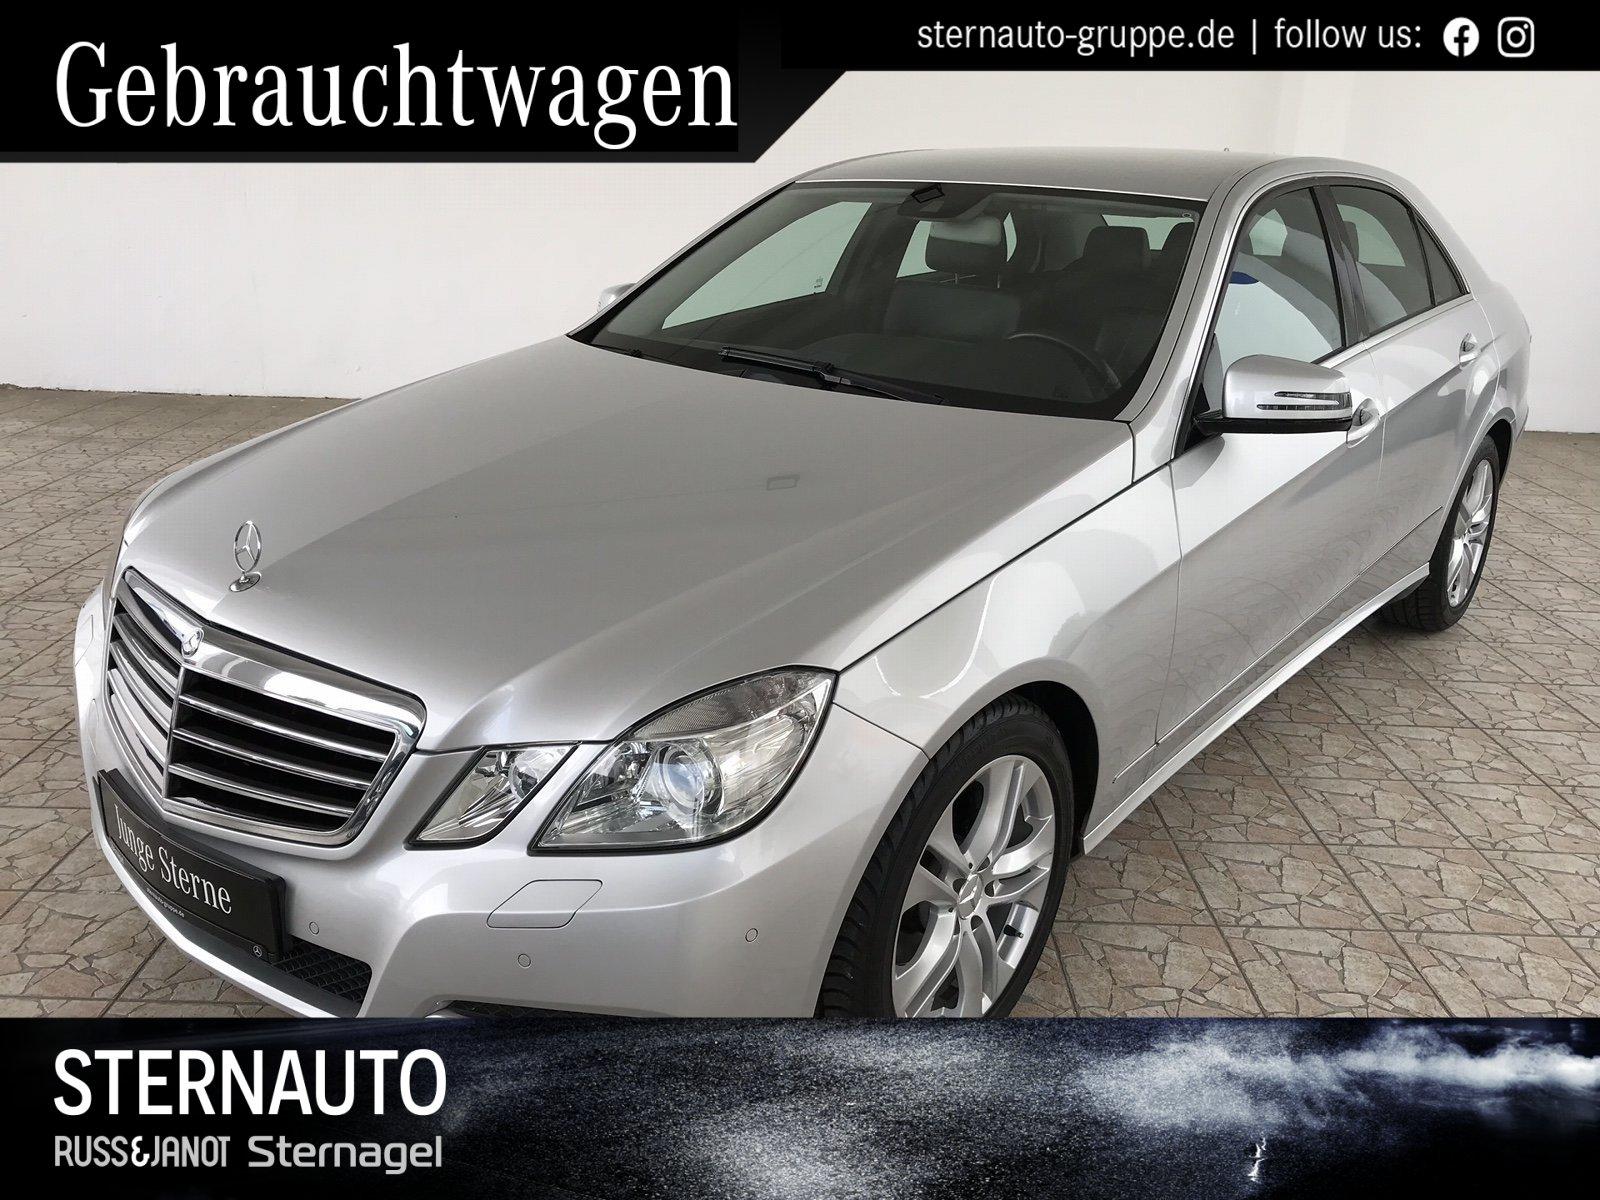 Mercedes-Benz E 200 Avantgarde/Navi/Parktronic/Sitzhzg./ILS, Jahr 2012, Benzin